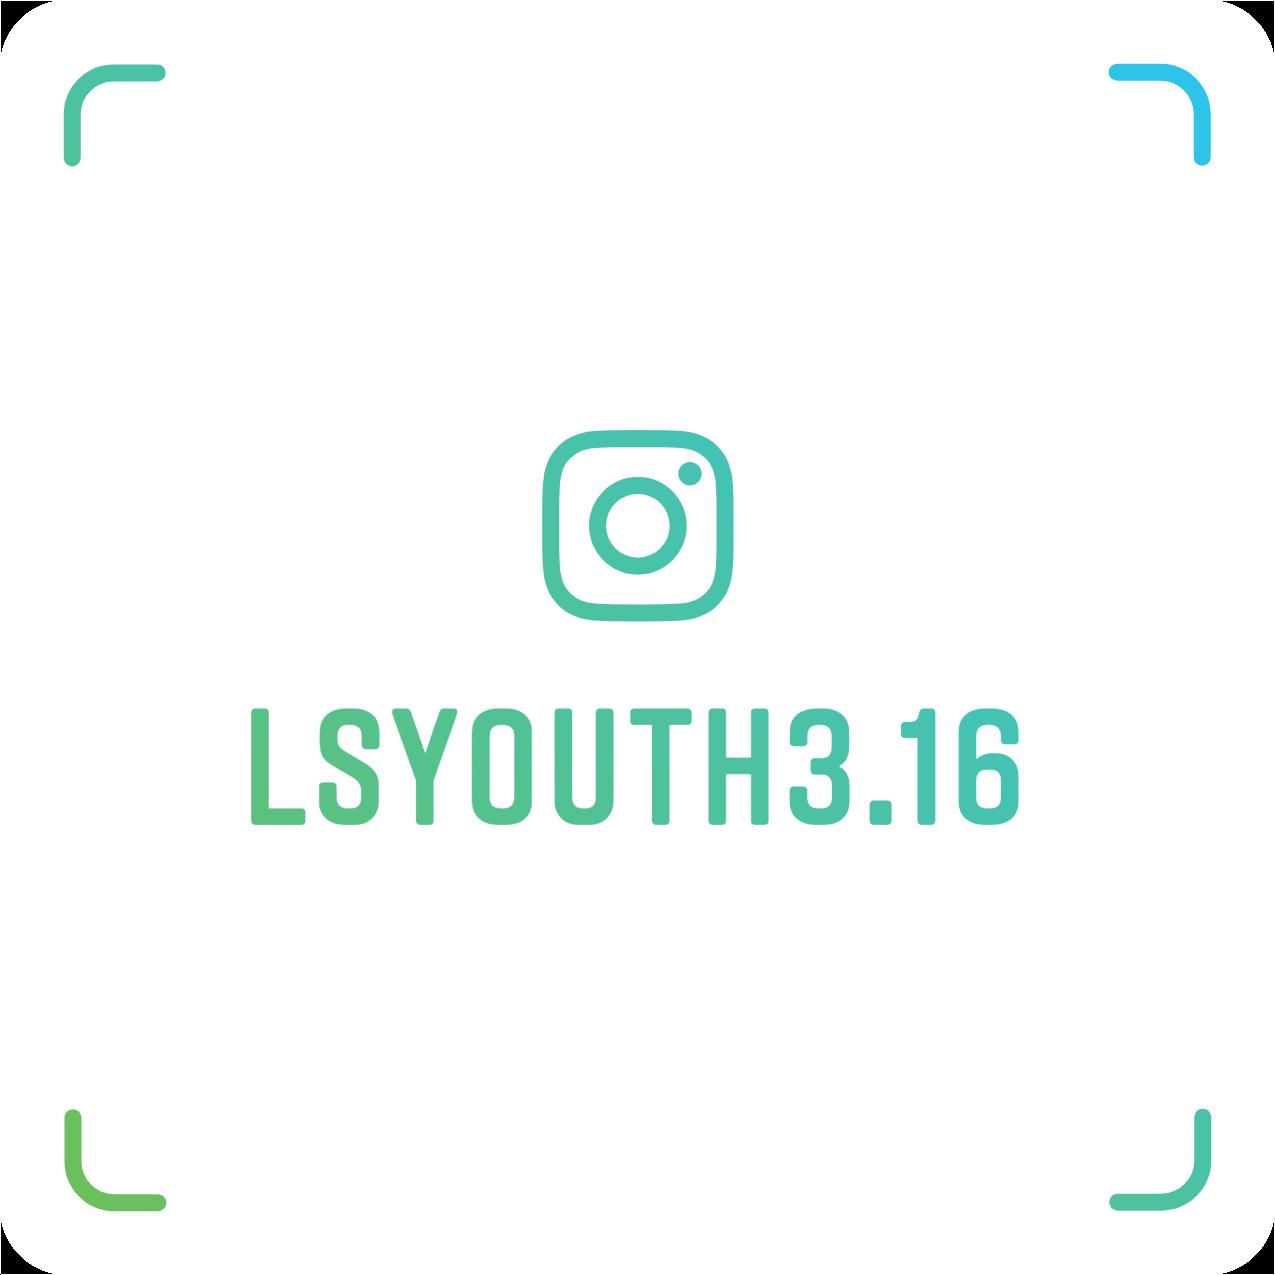 lsyouth3.16_nametag.png